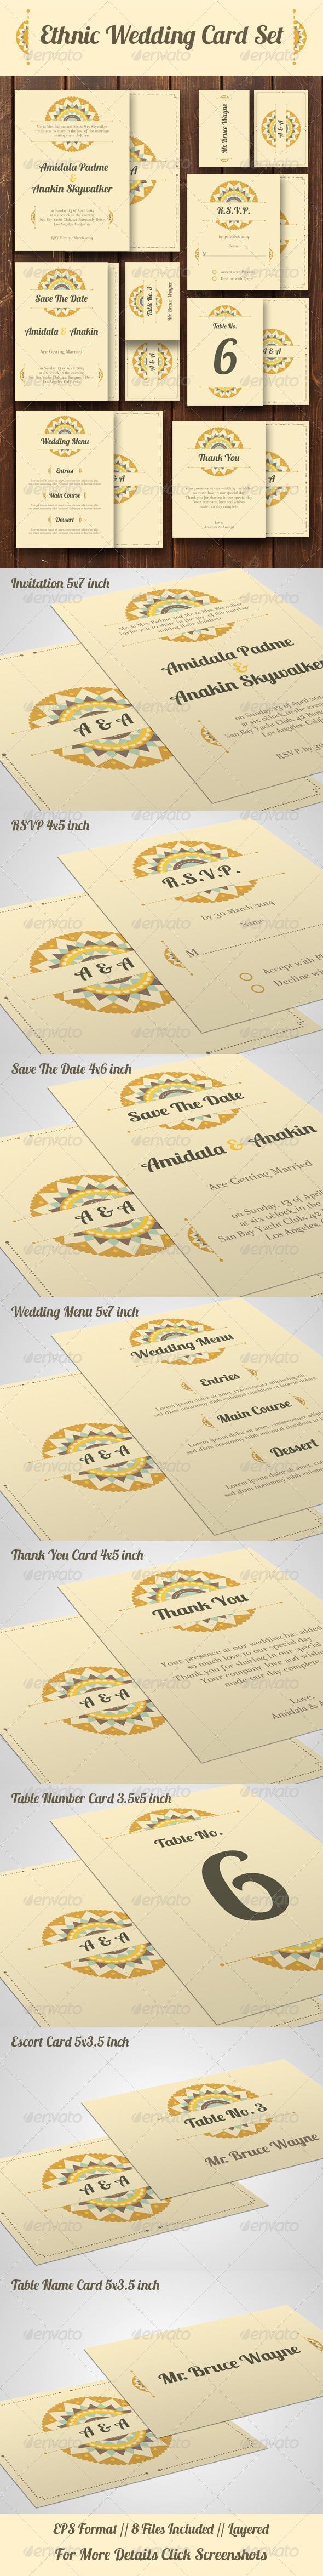 GraphicRiver Ethnic Wedding Card Set 7737793